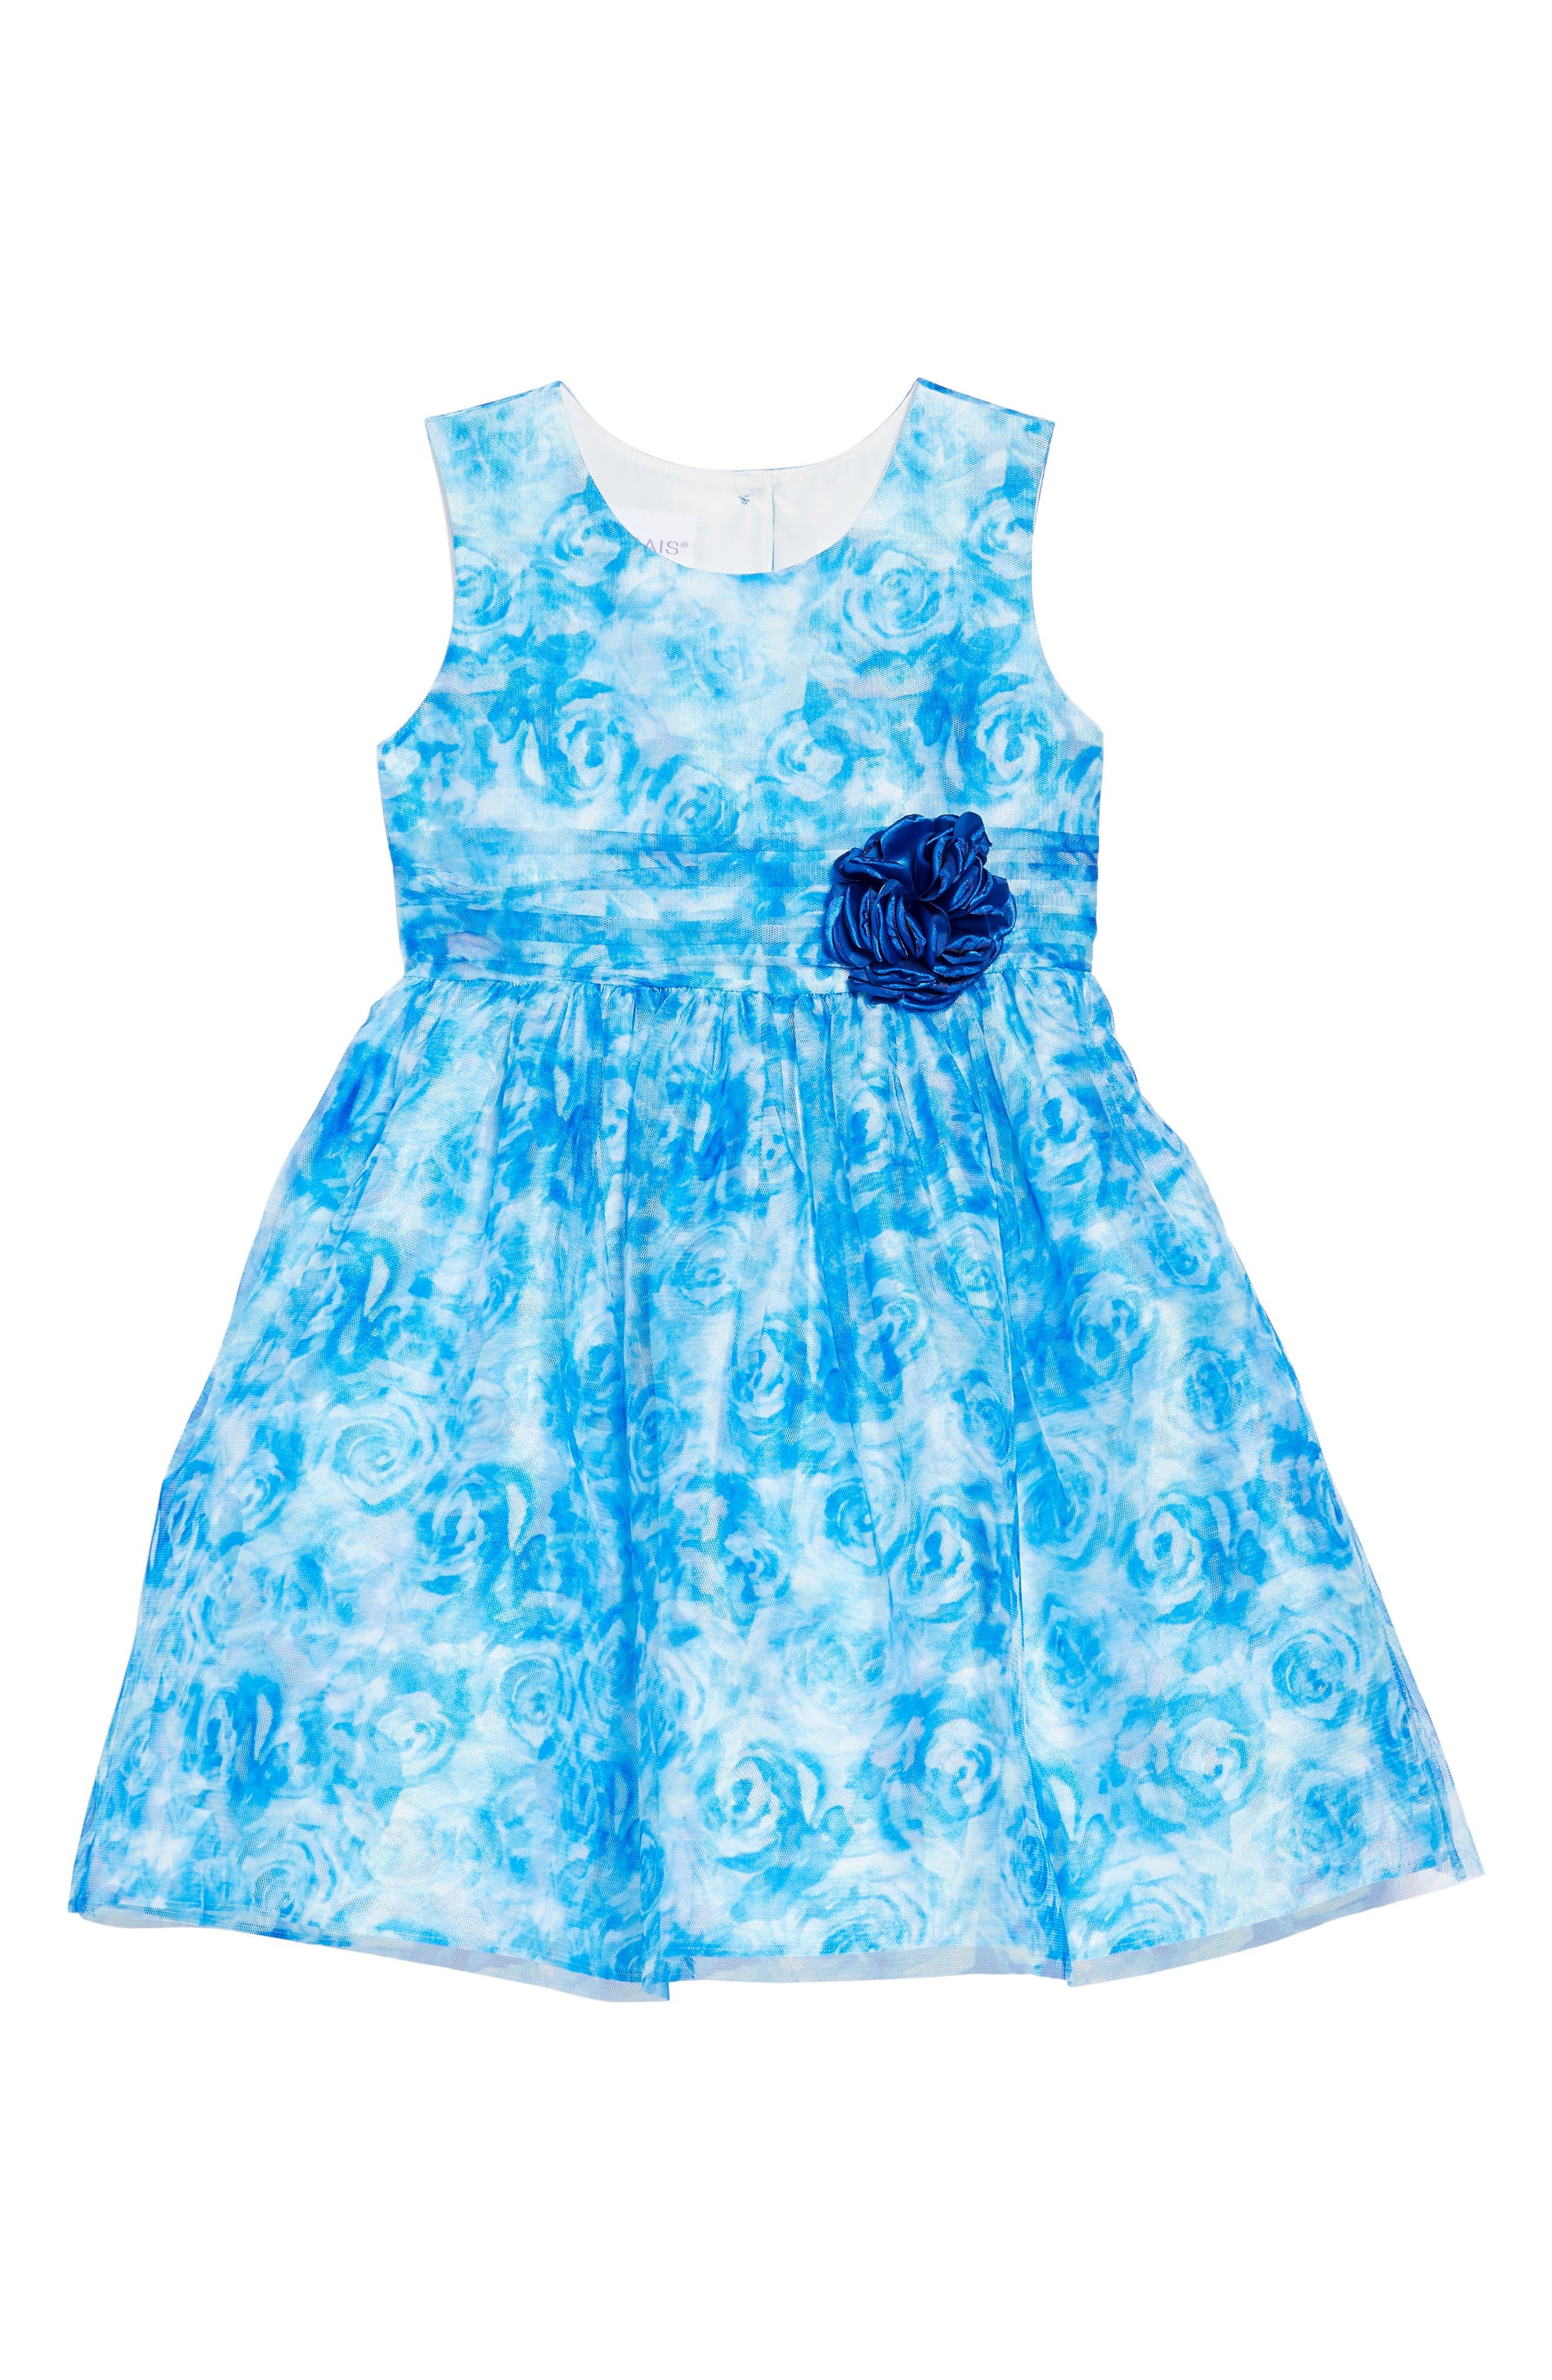 FRAIS, Rose Mesh Overlay Dress, Main thumbnail 1, color, BLUE